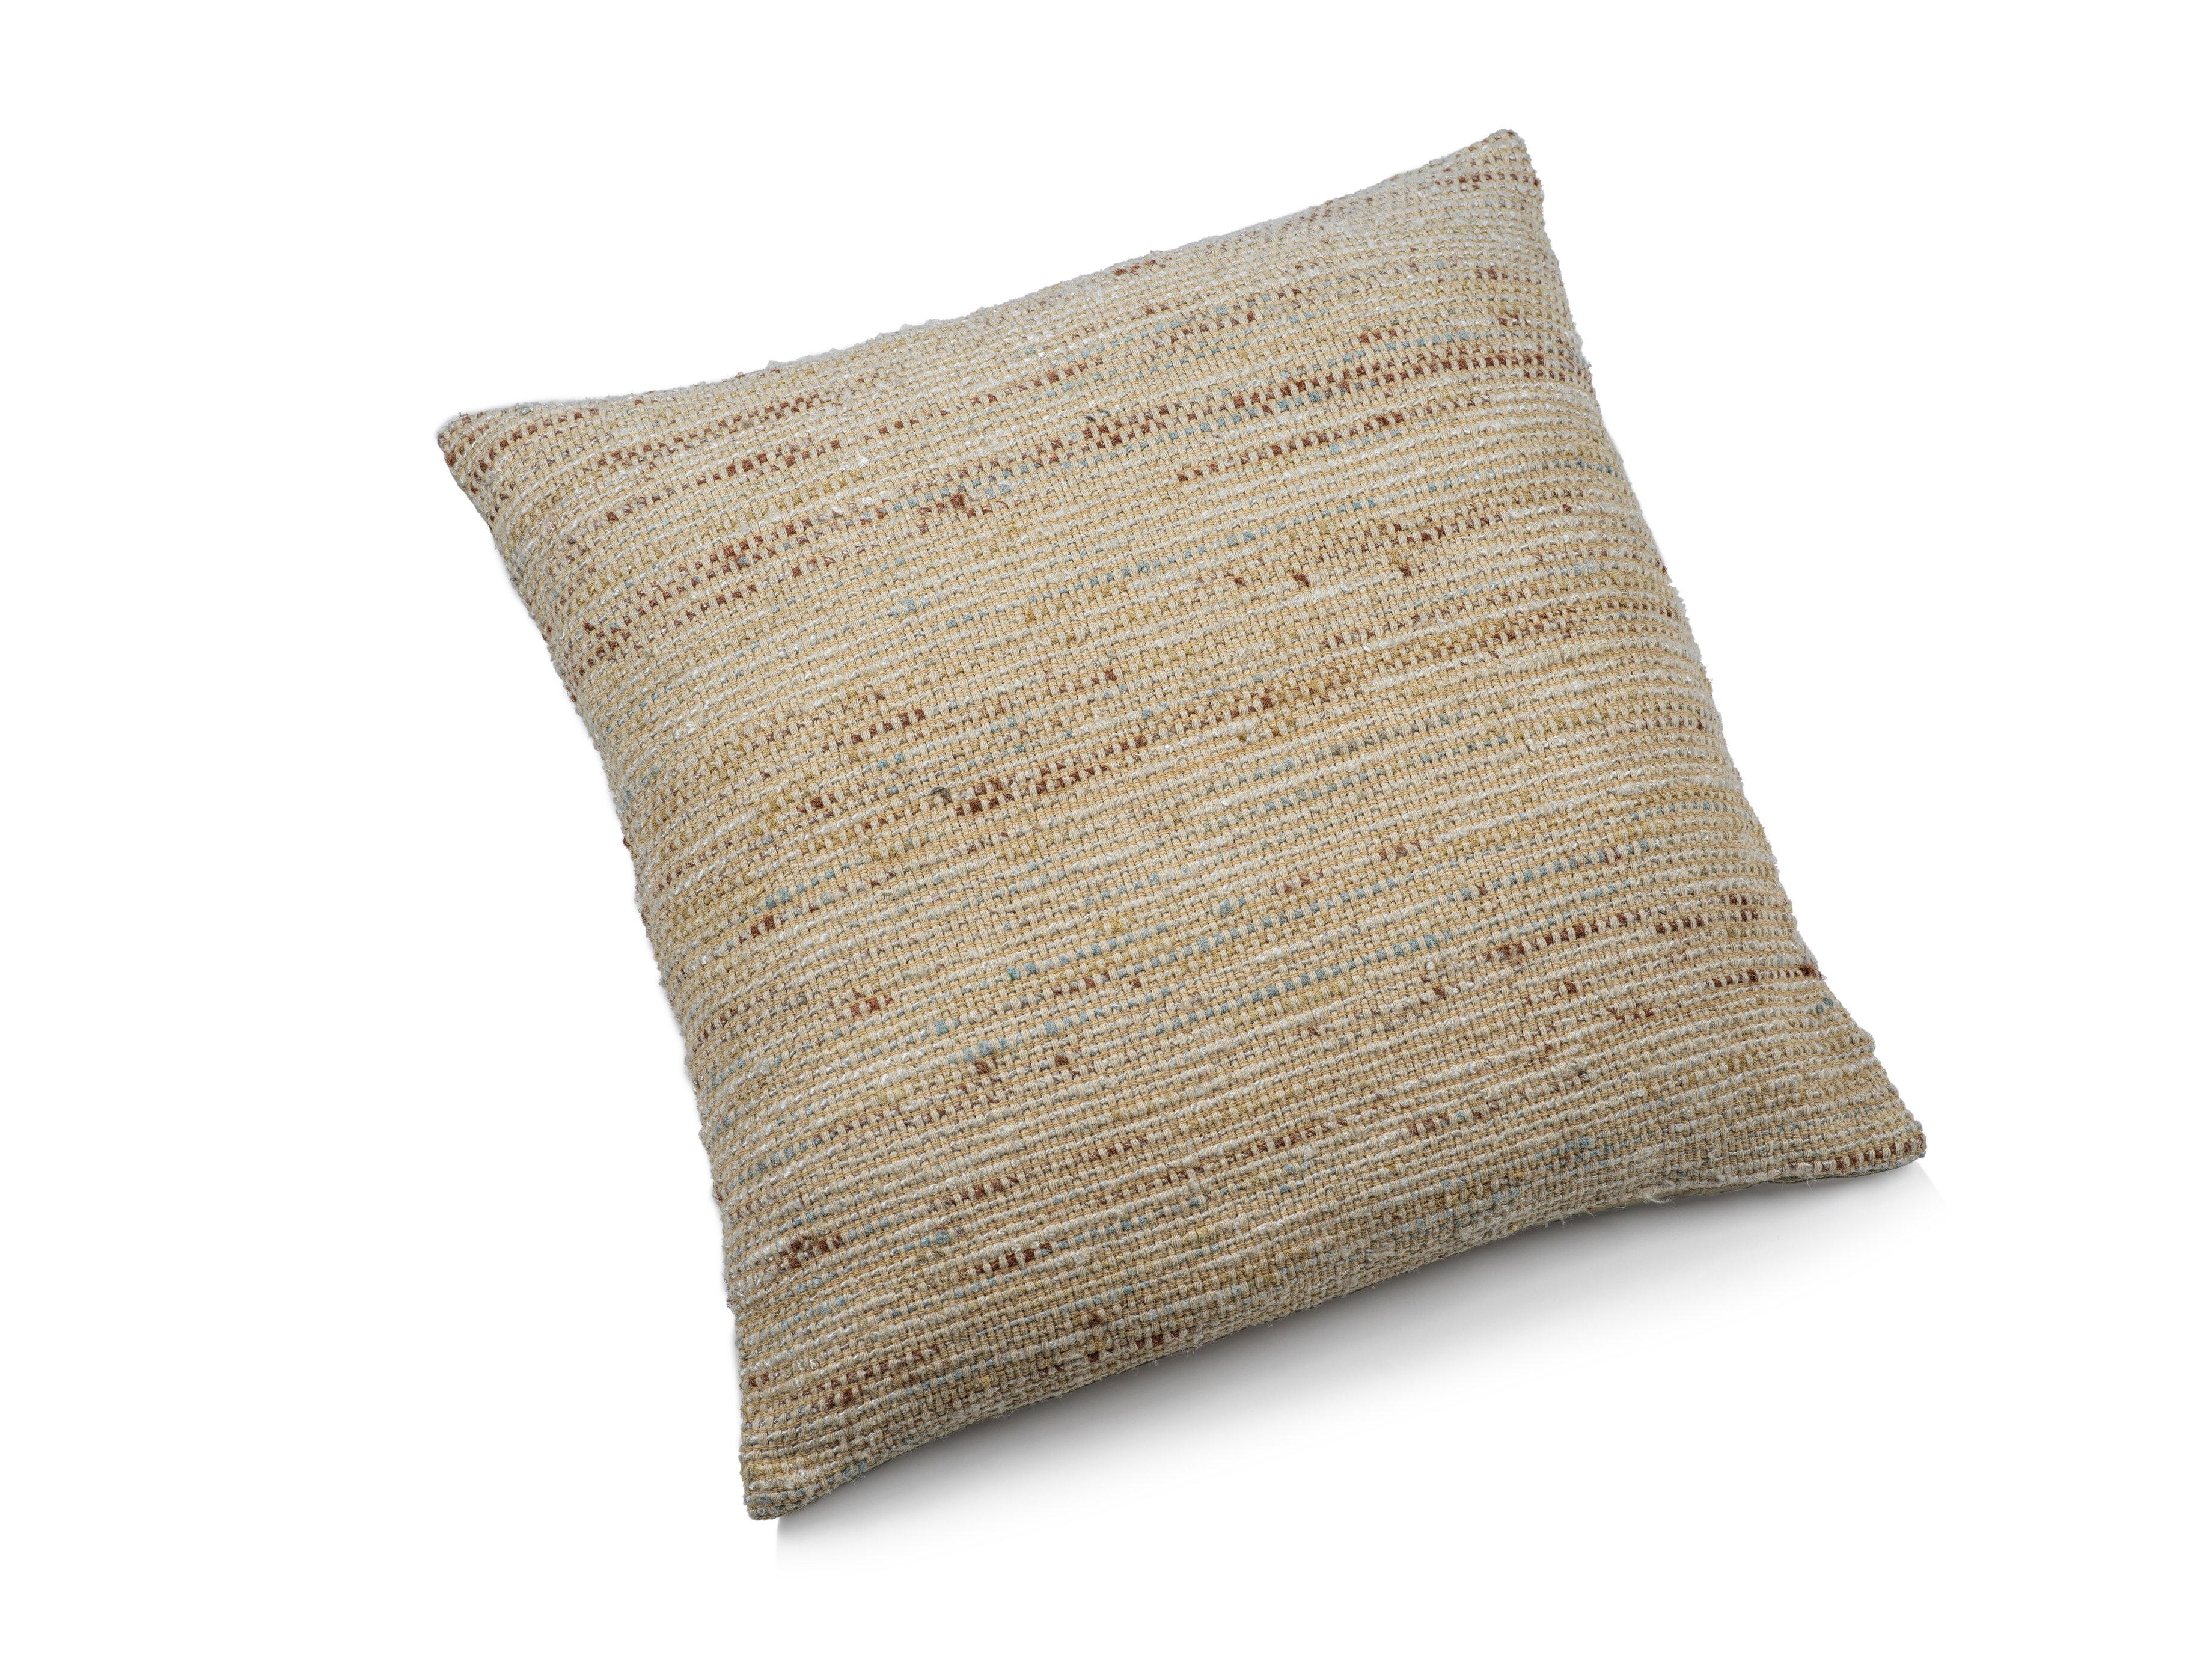 Gracie Oaks Sissel Cotton Feathers Abstract Throw Pillow Wayfair